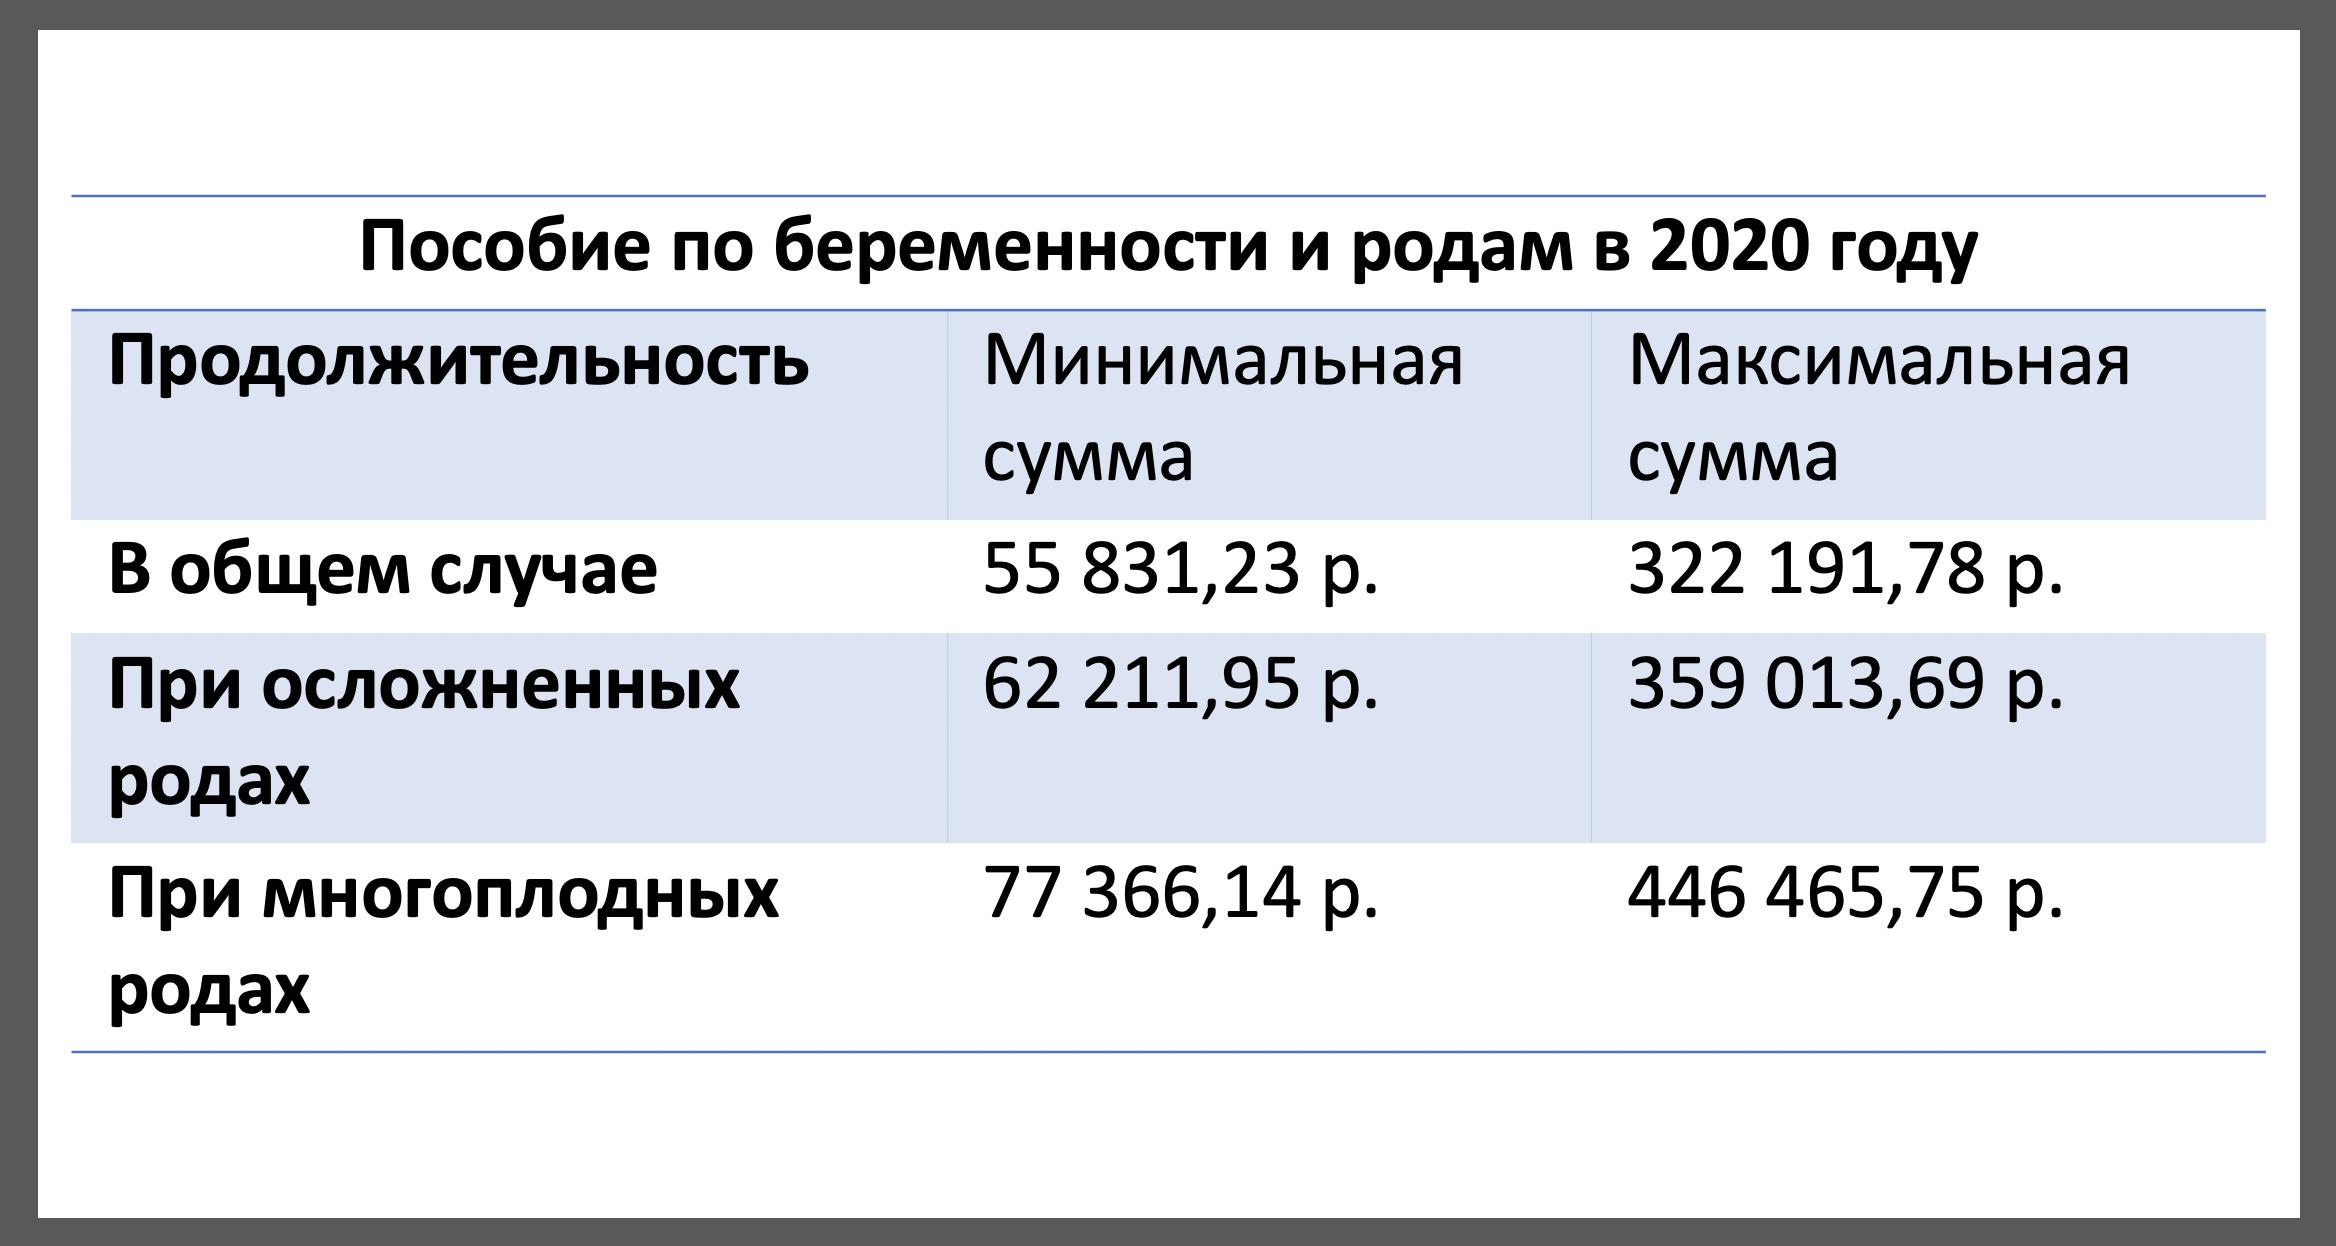 Порядок приема на работу до получения патента в 2020 году